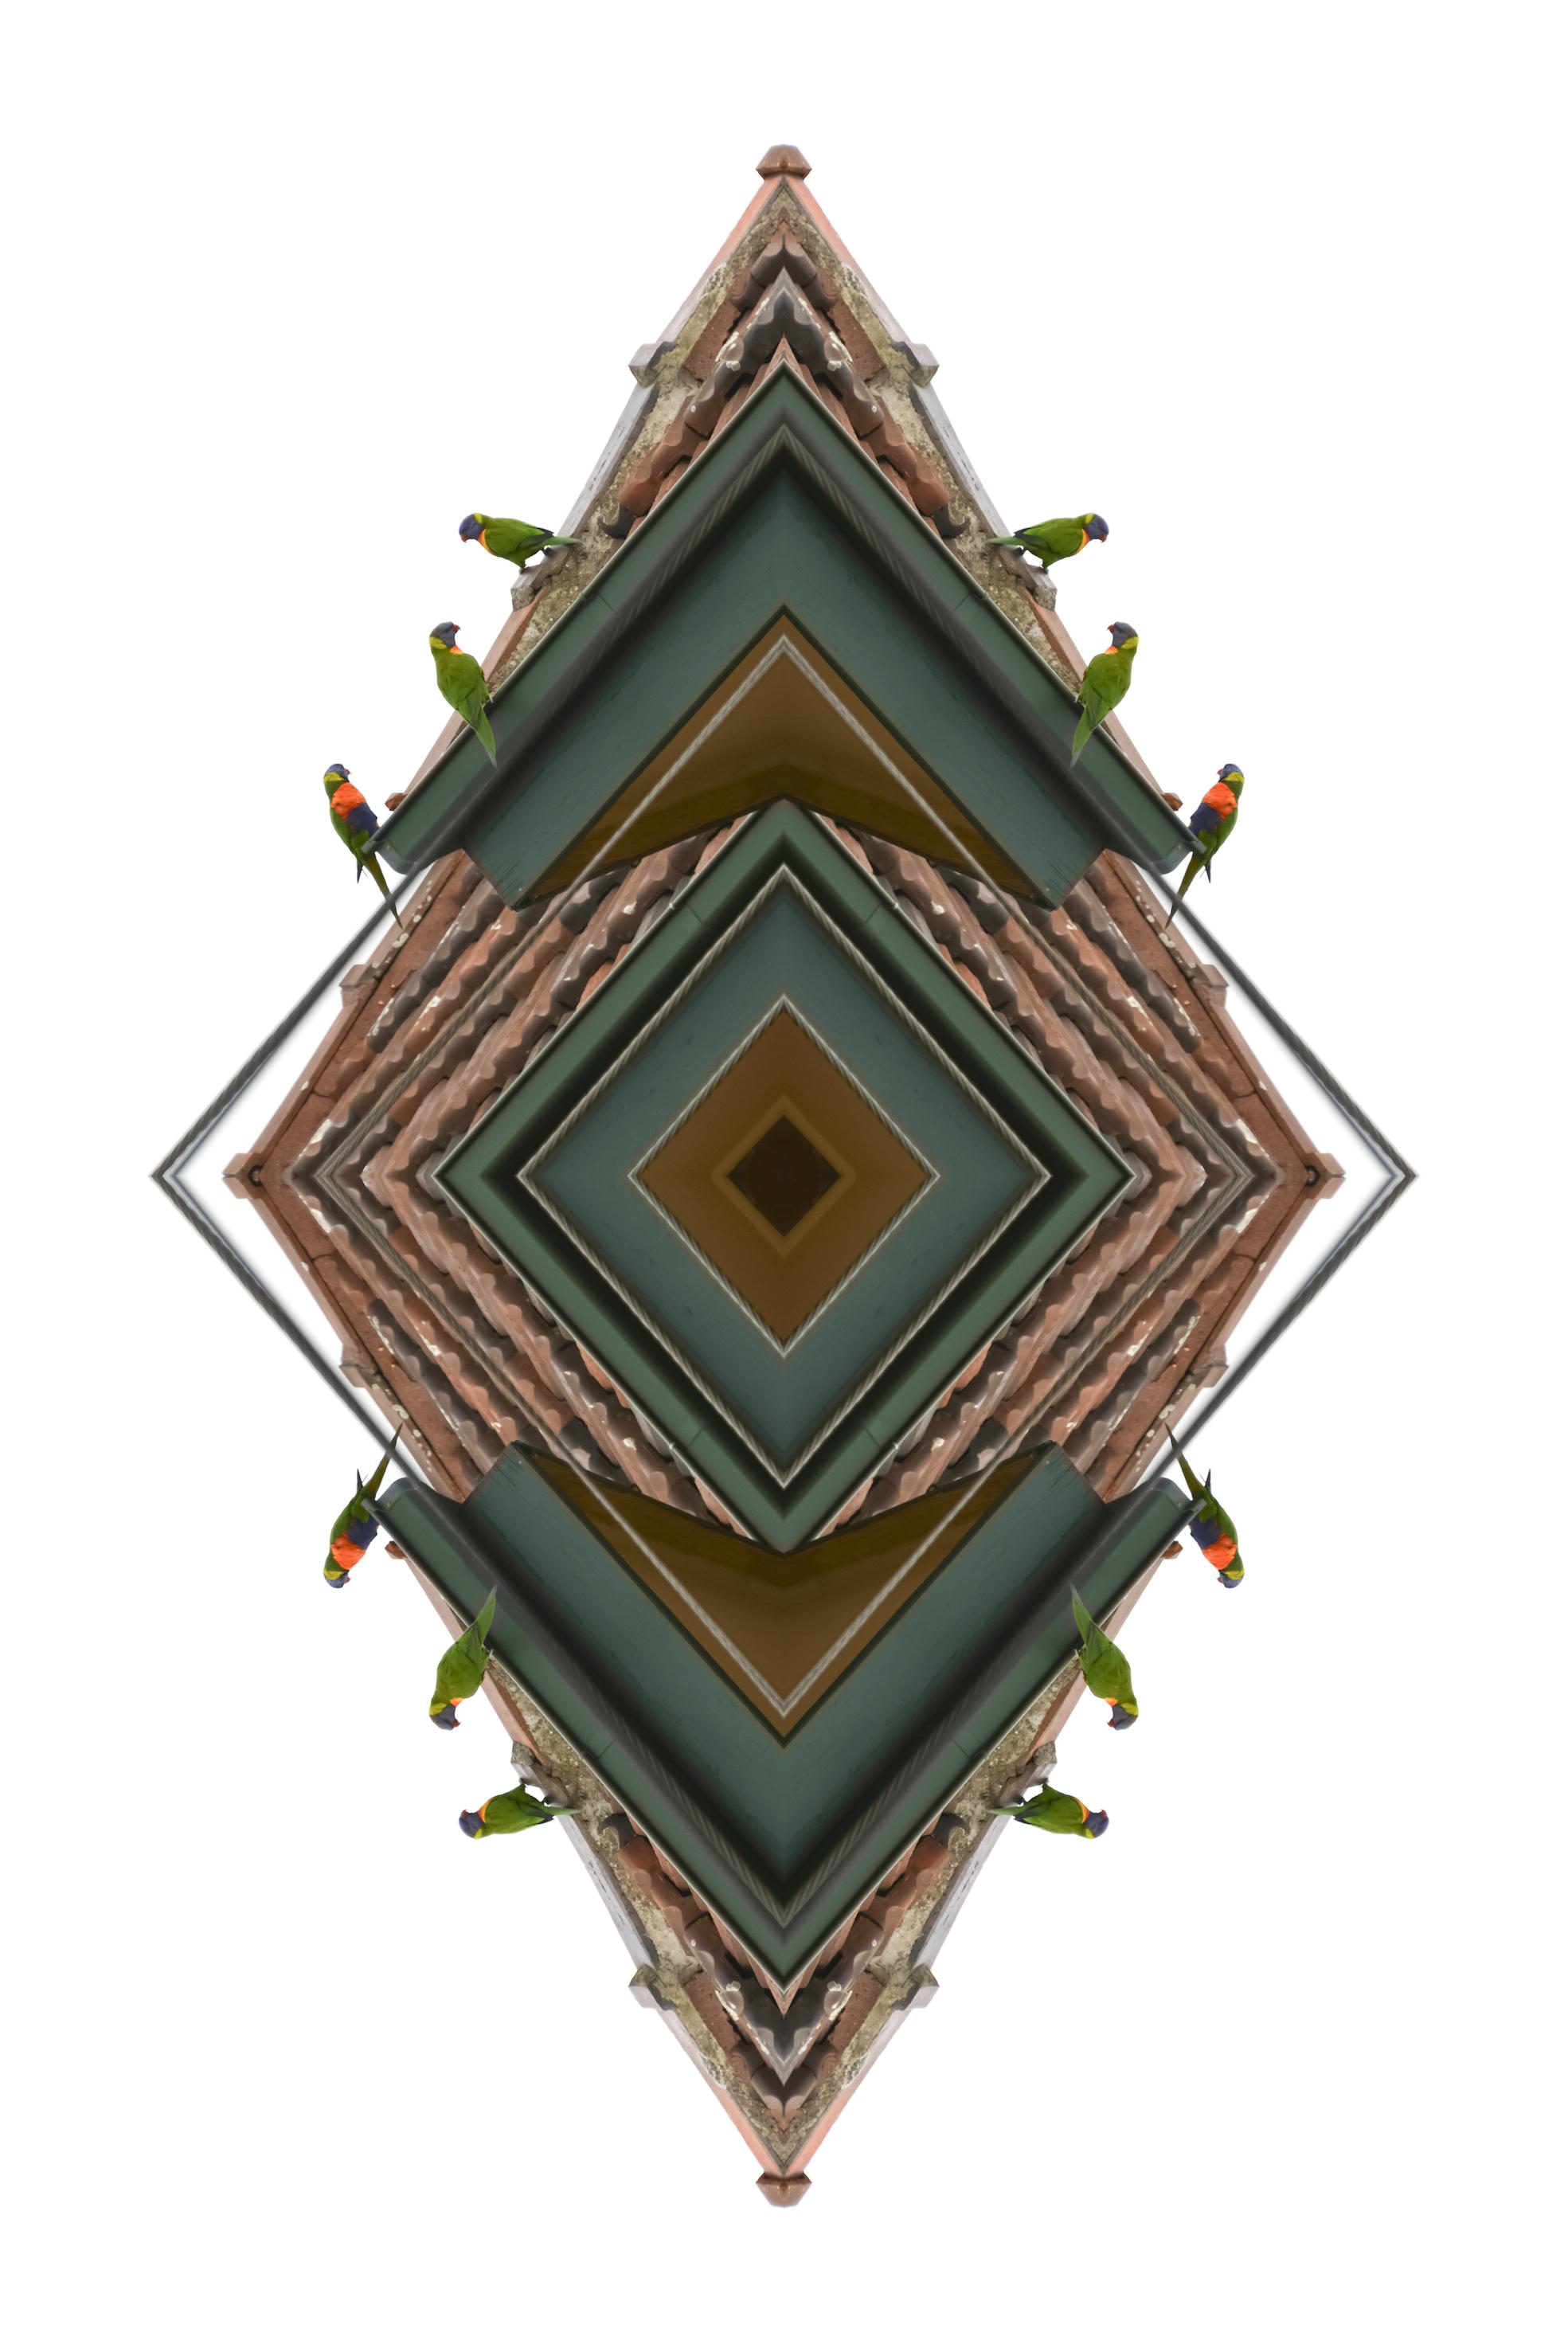 Rainbow Lorikeet,  2017  Archival print on cotton rag paper  125 x 85 cm